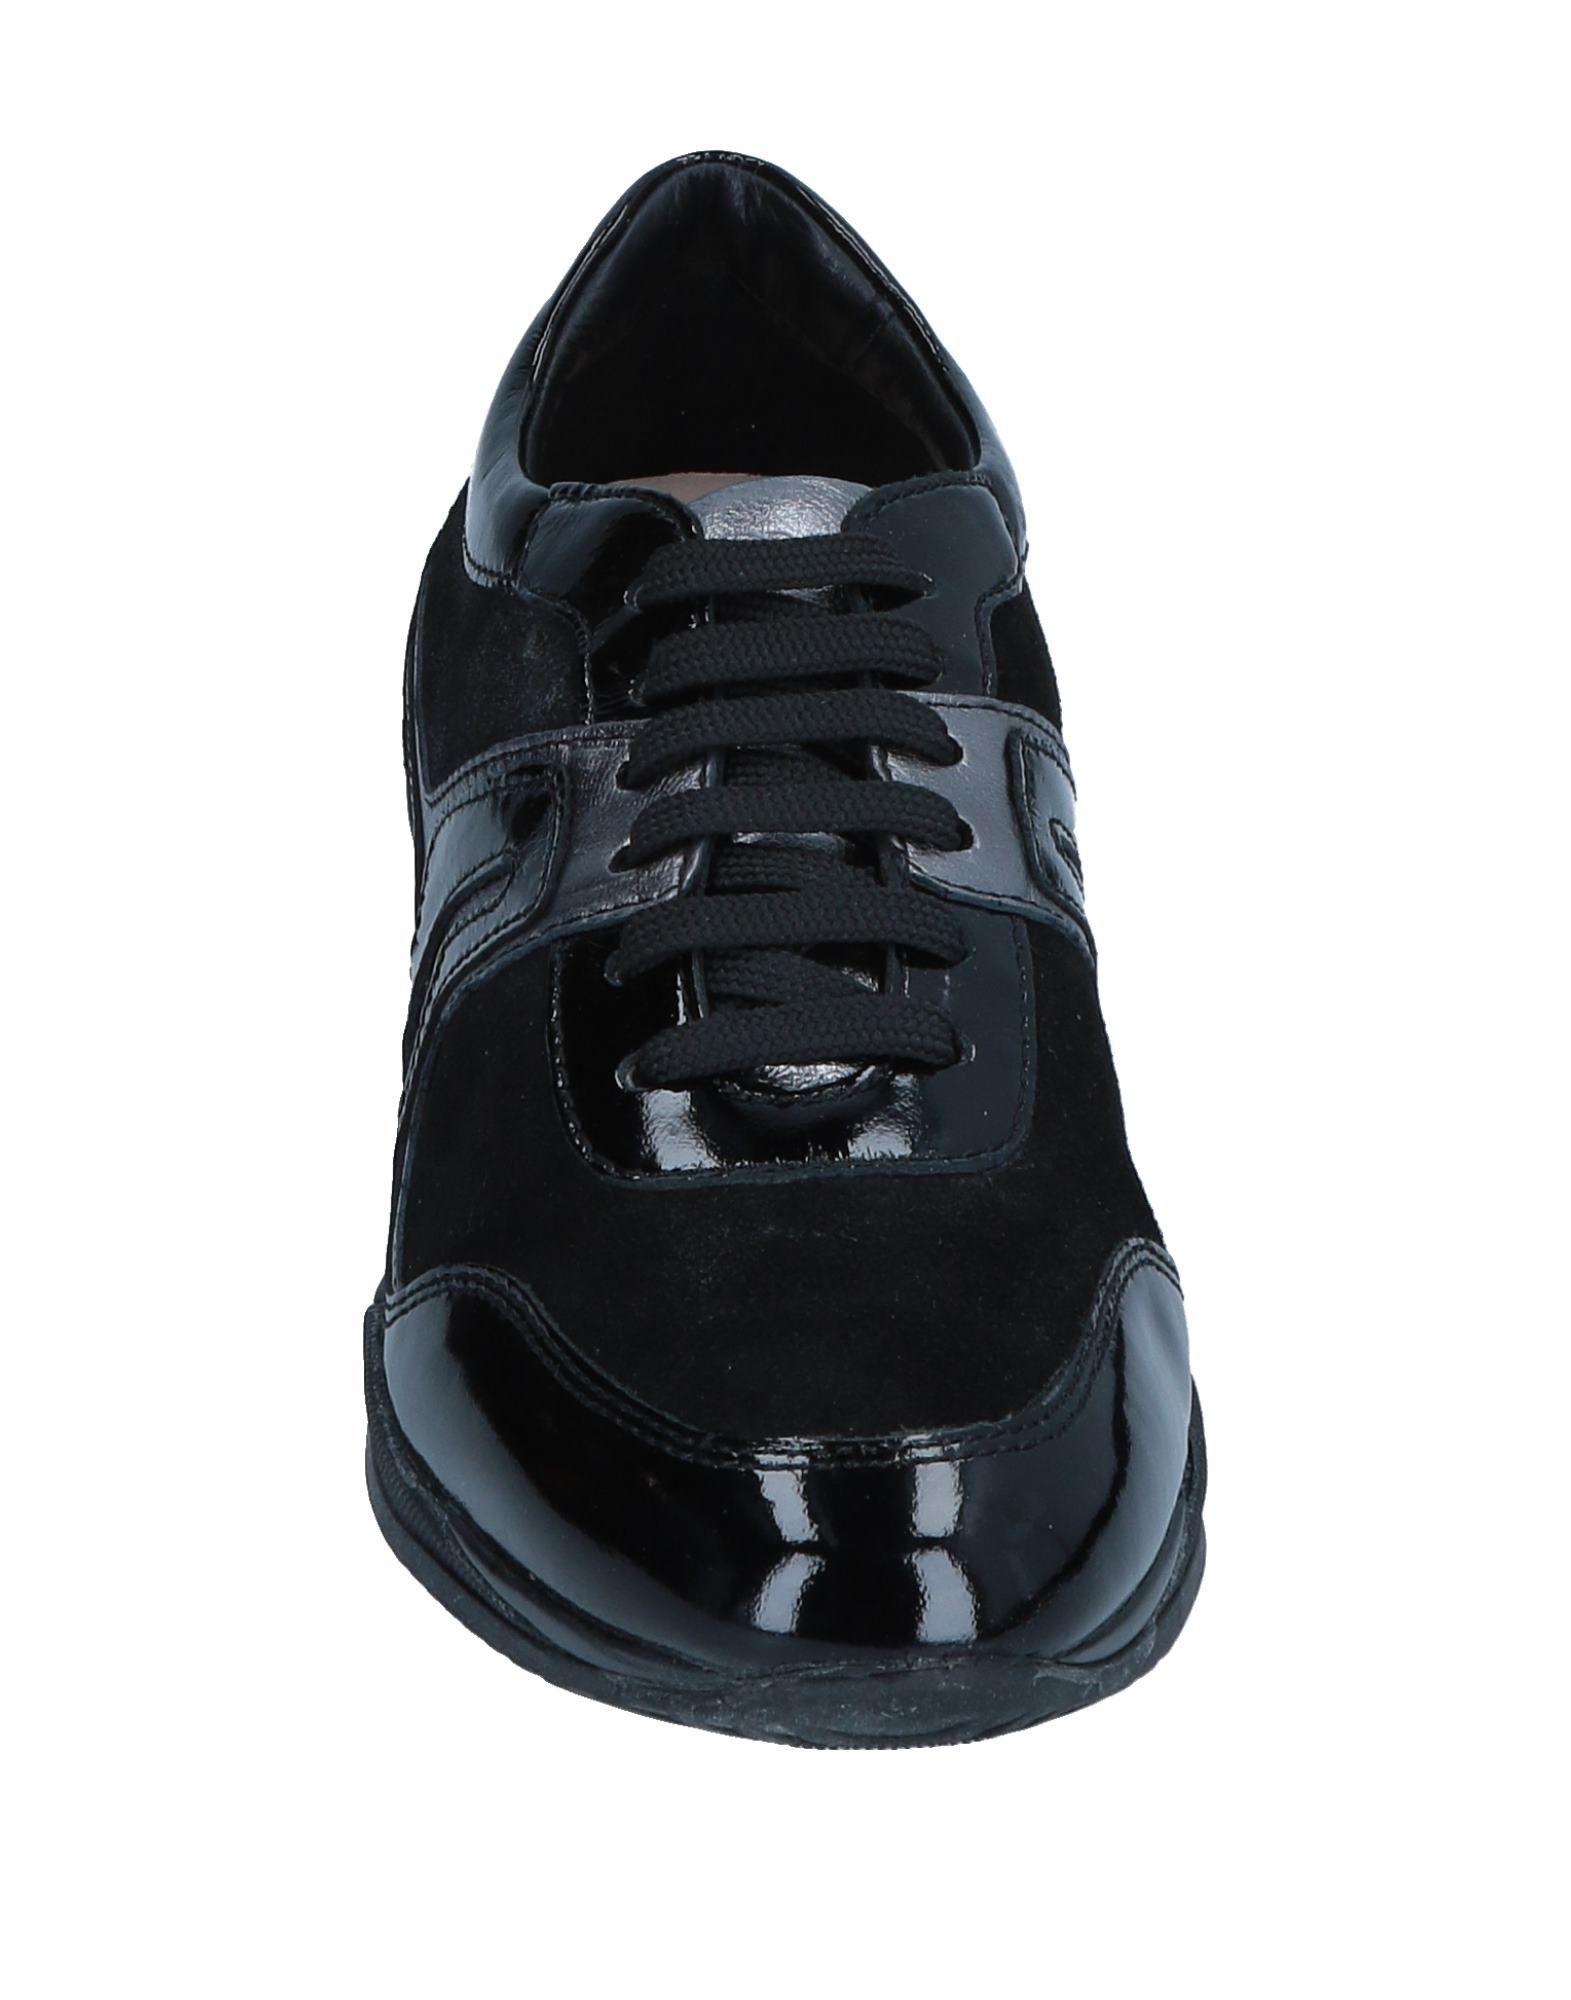 Geox Sneakers Damen  Schuhe 11554085UD Gute Qualität beliebte Schuhe  7414bd